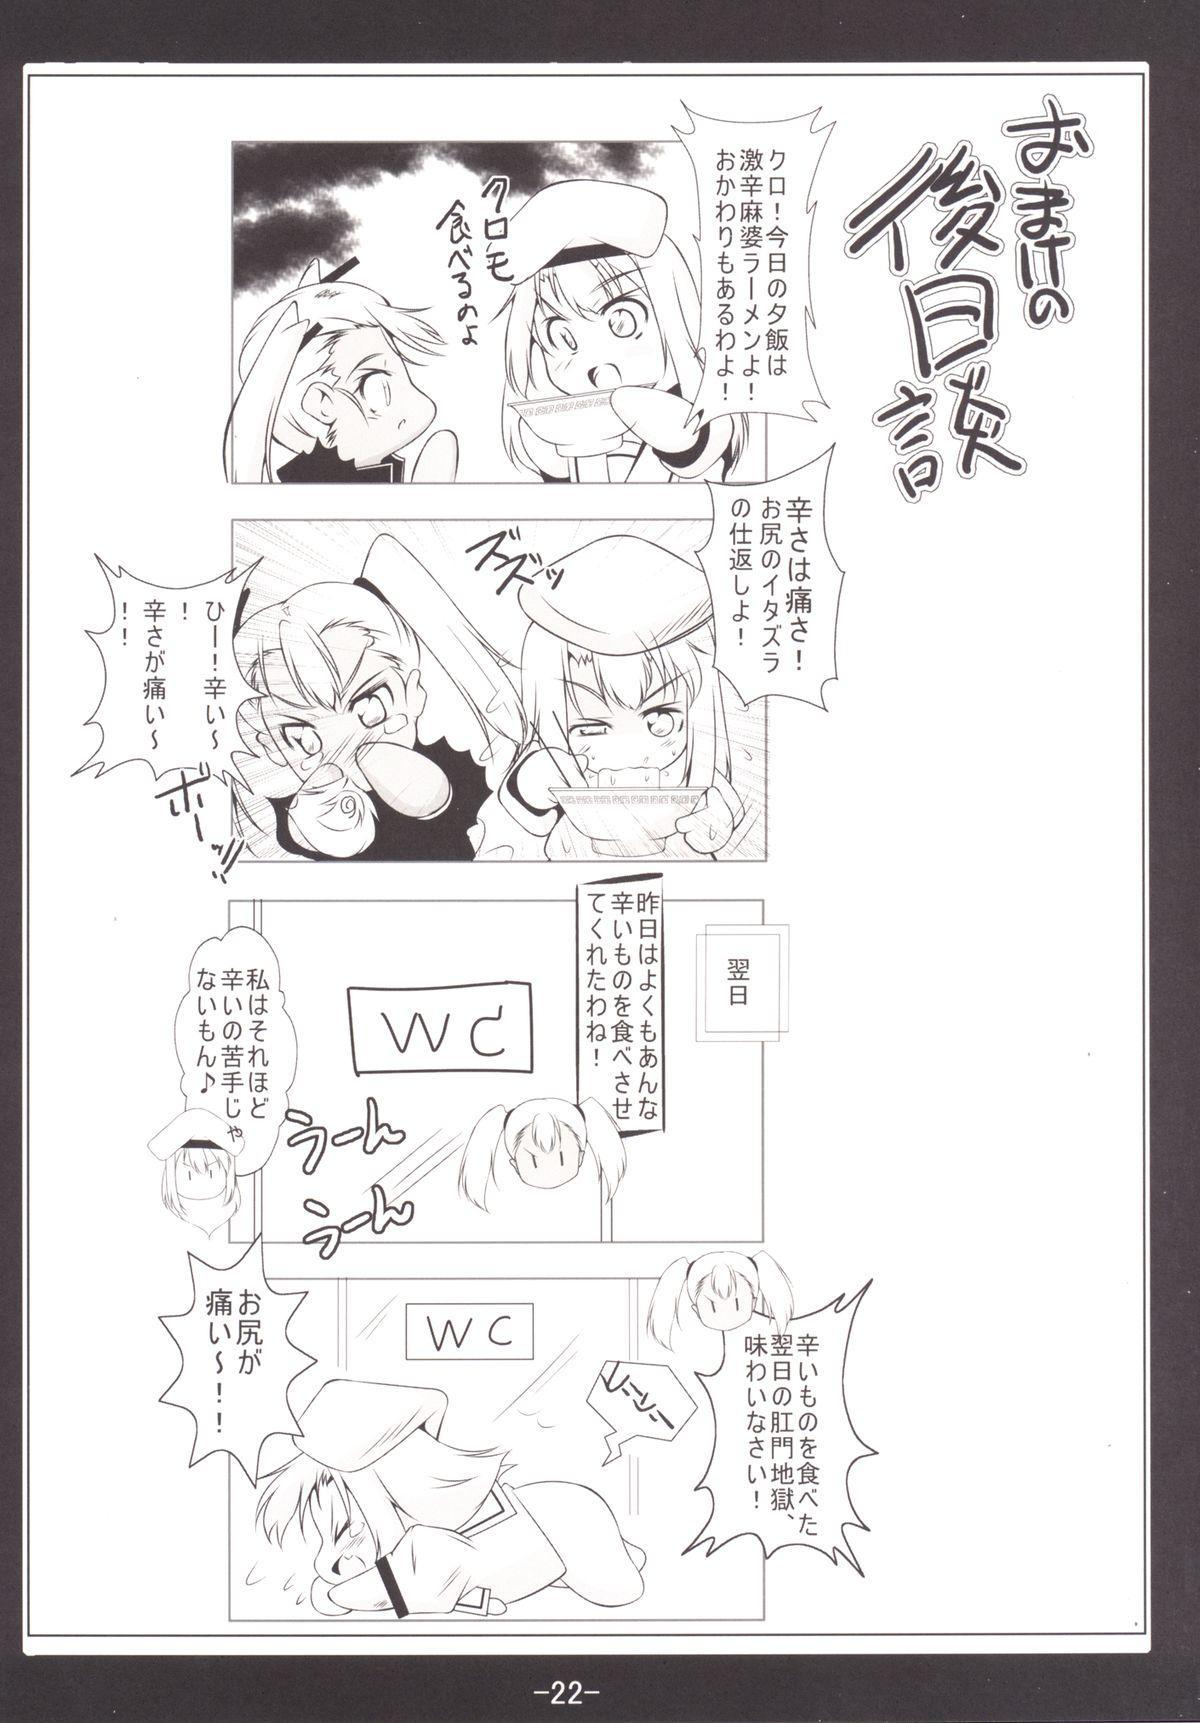 Kuro to Illya no KOUkan Kyouyuu 22